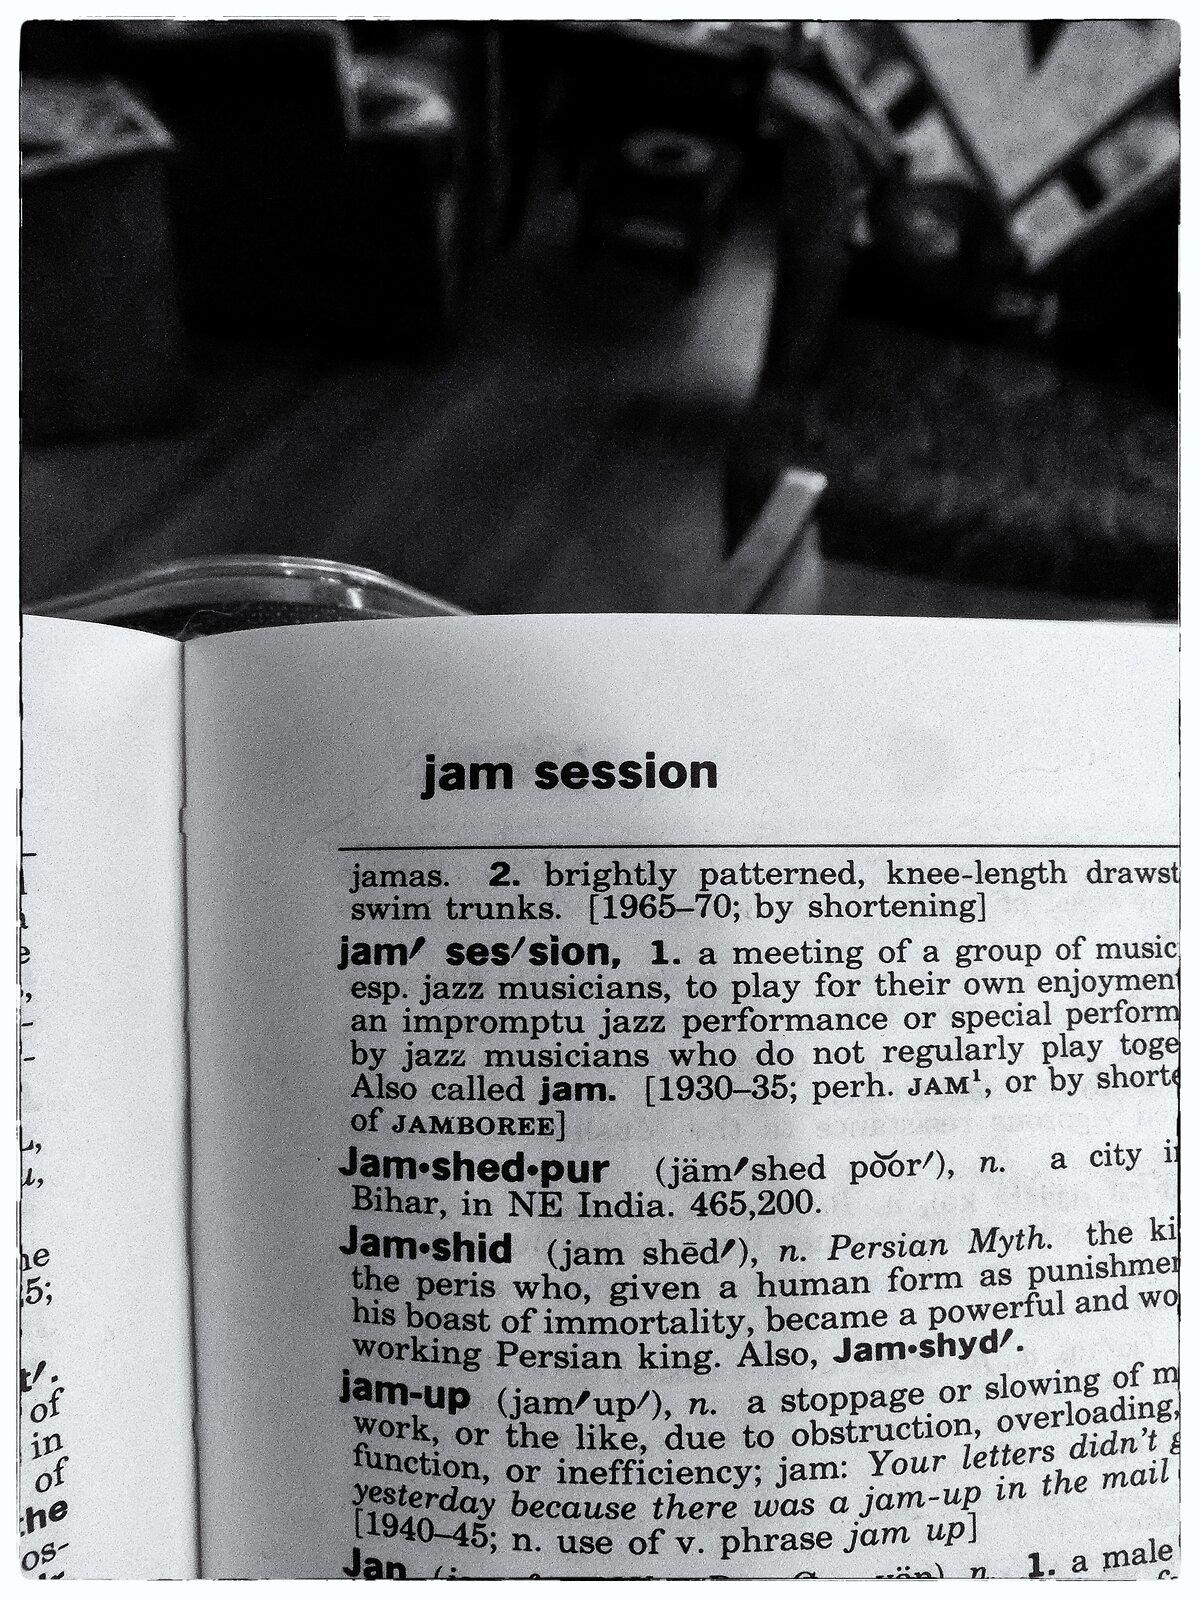 XP_July28_jam_session(SilverEfex).jpg